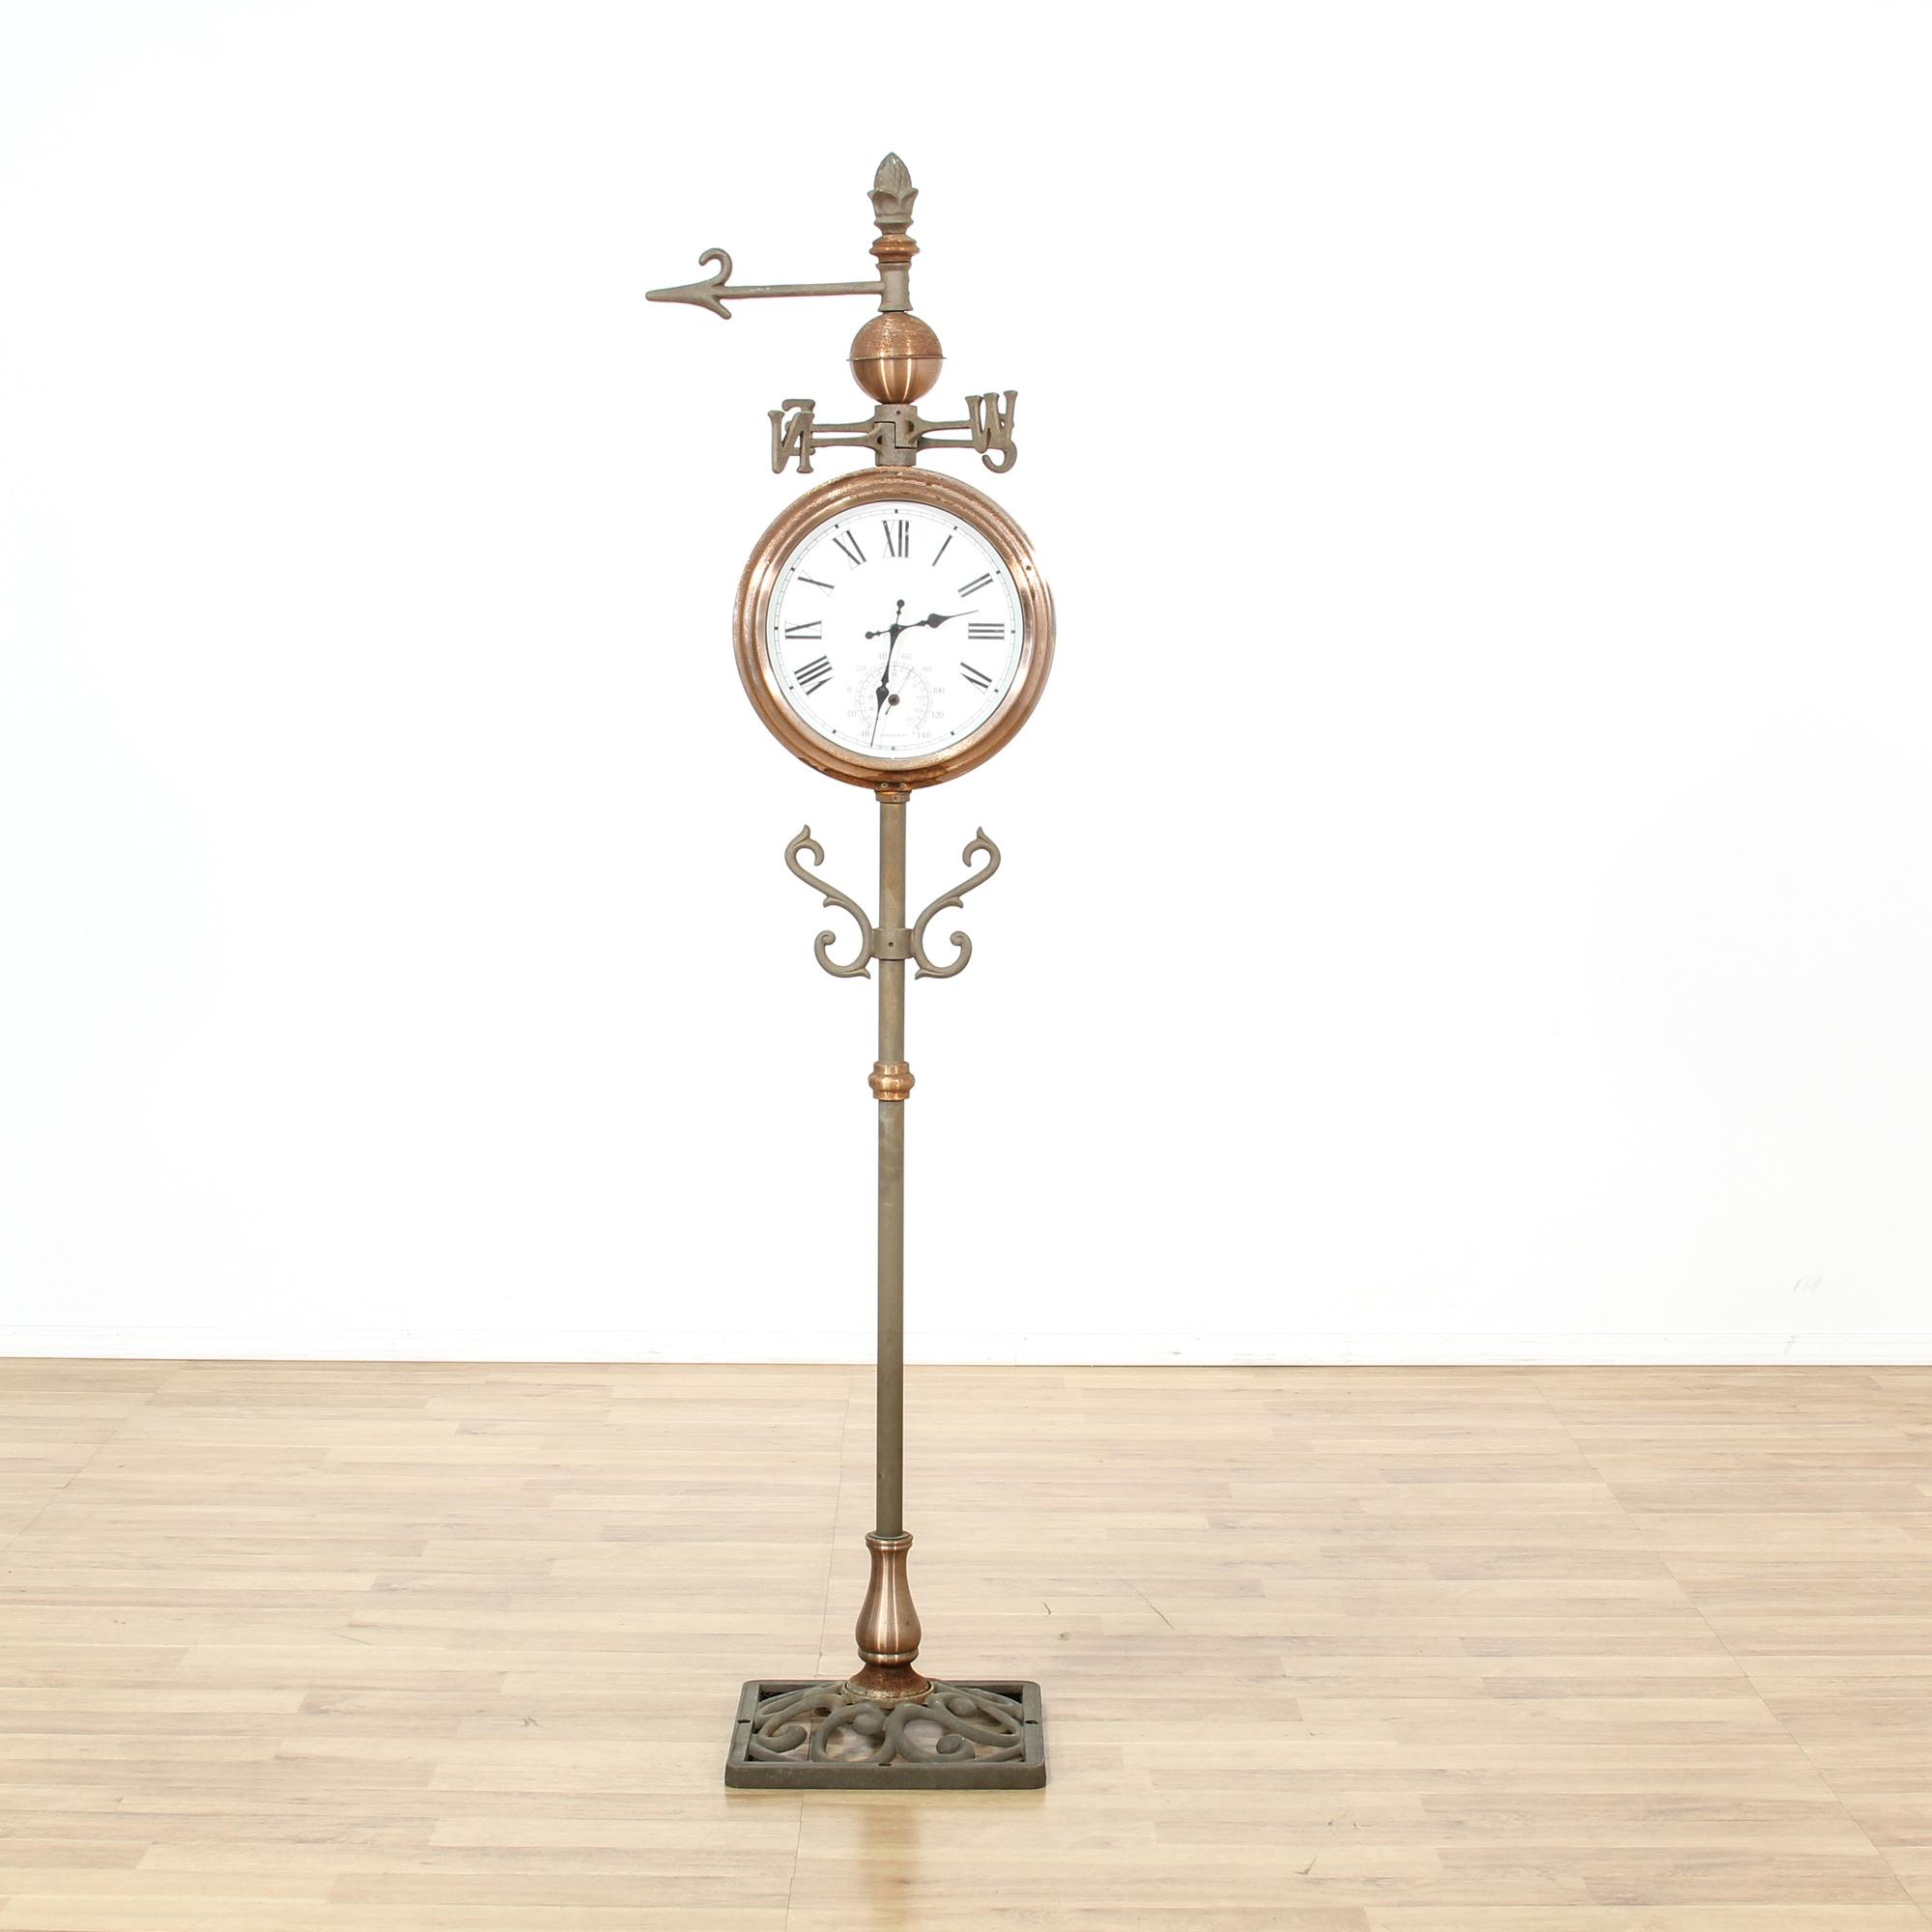 Copper Amp Brass Weathervane Clock Stand Loveseat Vintage